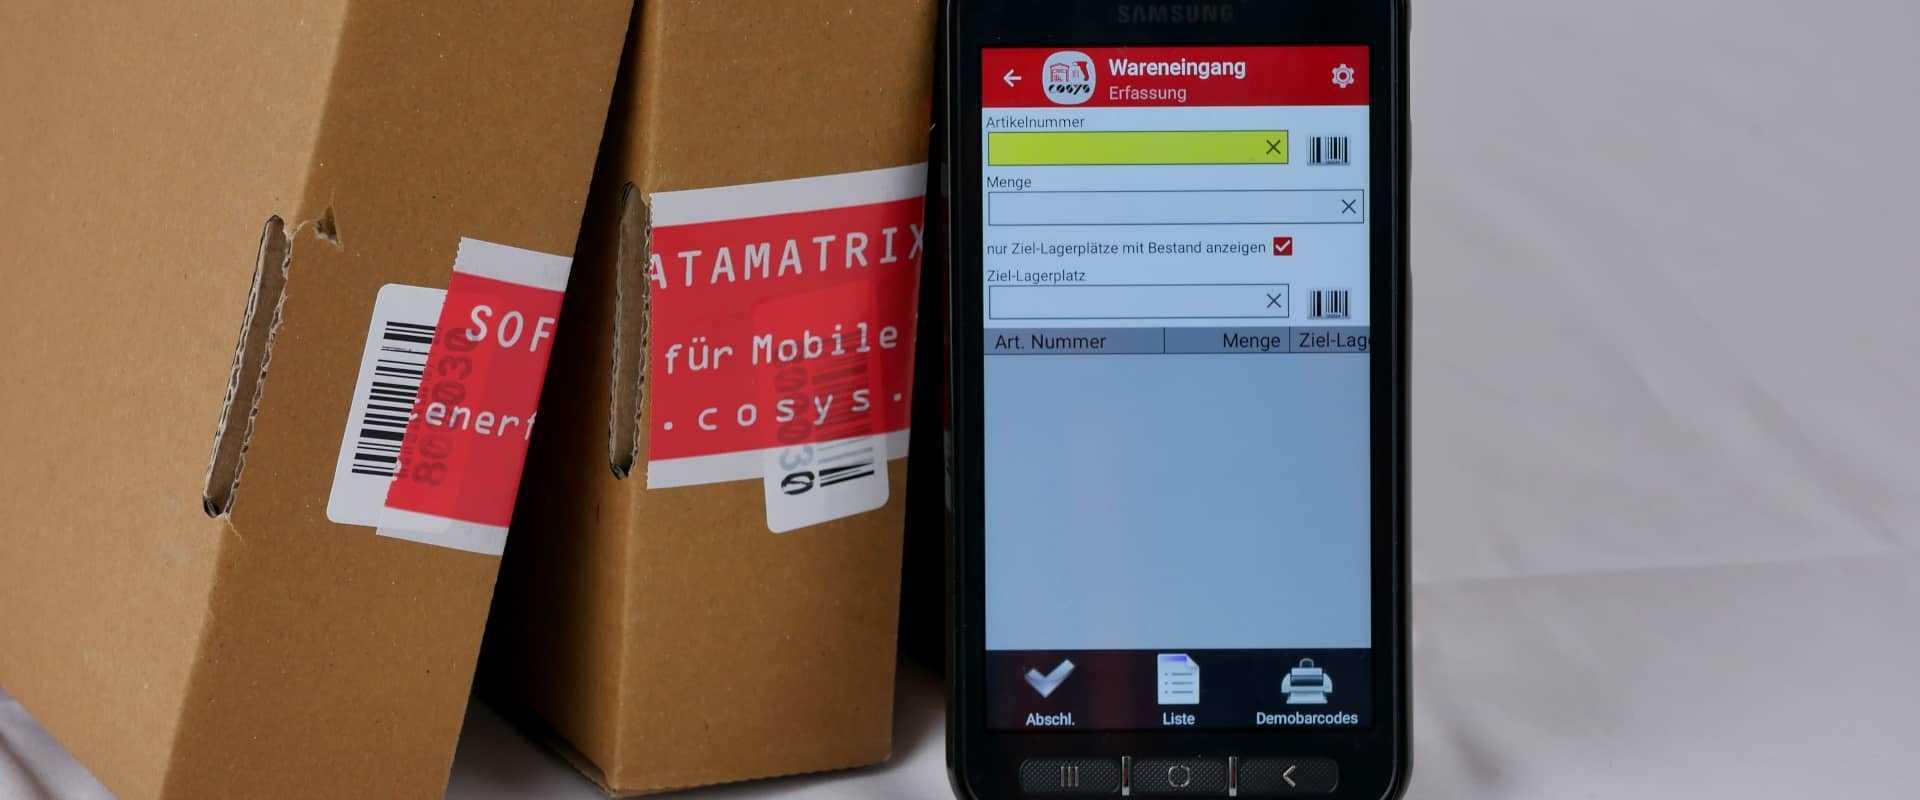 Das Bild zeigt COSYS mobile Bestandsfuehrung App fuer Smartphones - Android und iOS